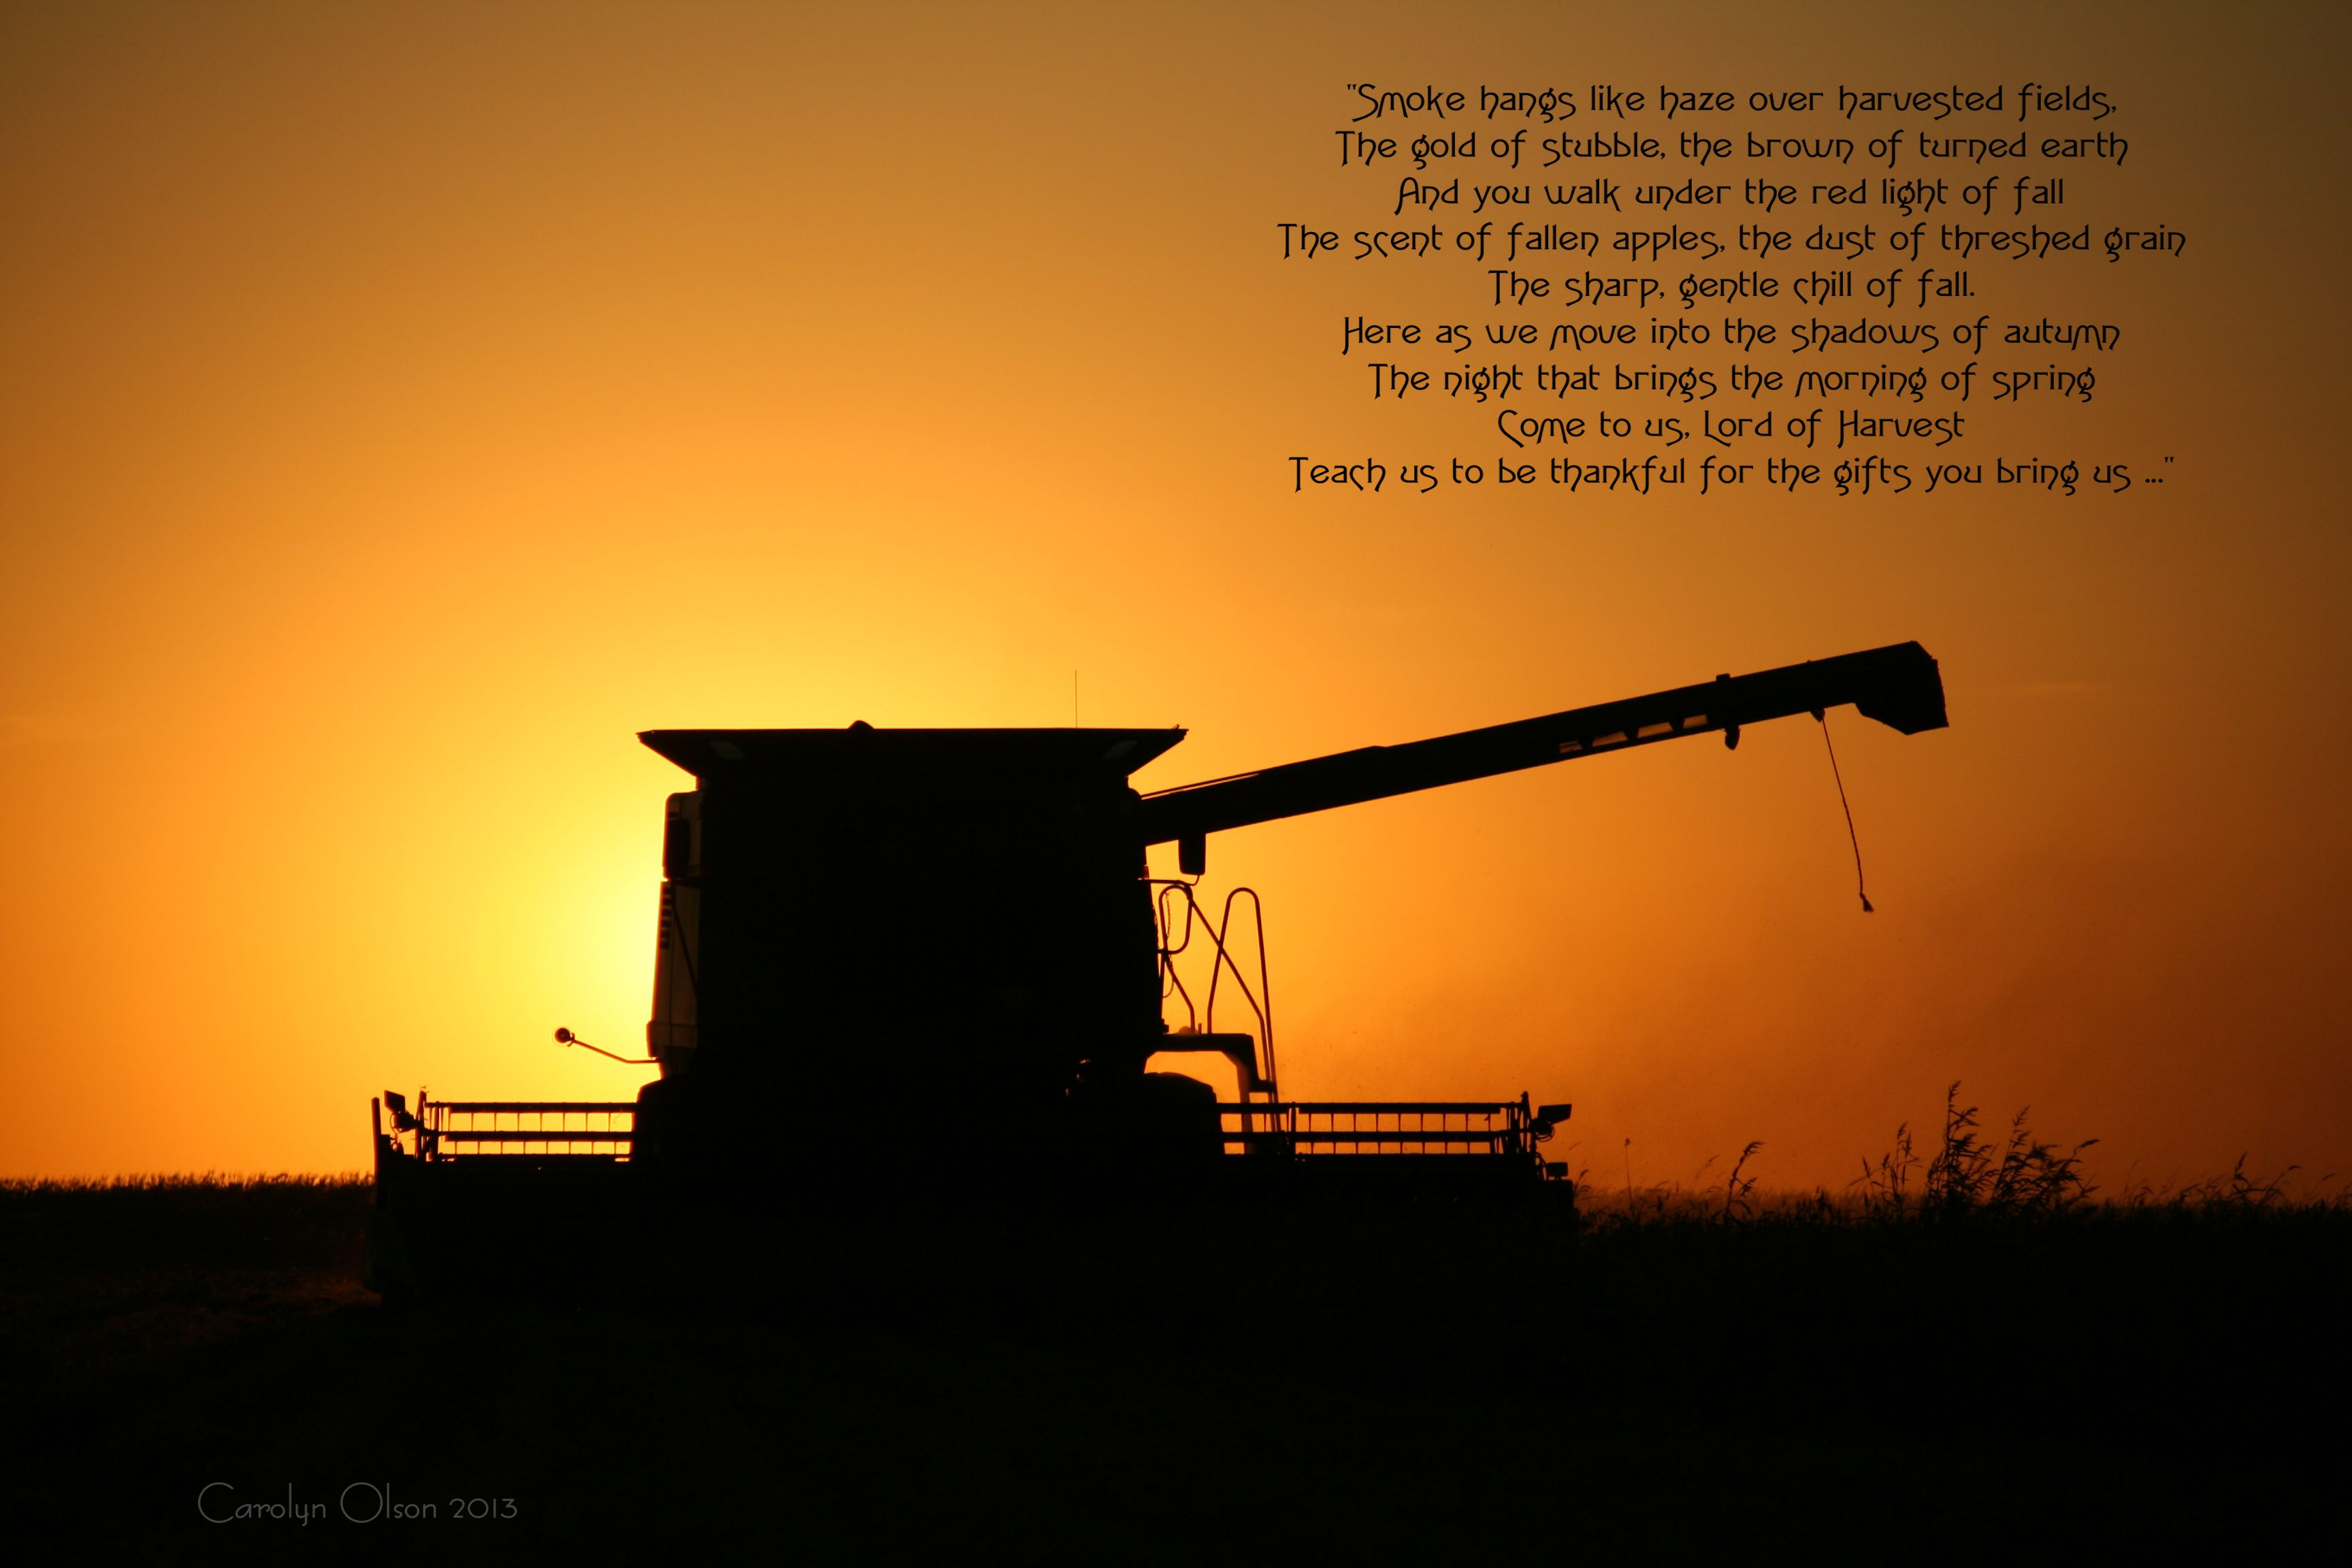 An Old Farmers Advice Poem - Harvest poem